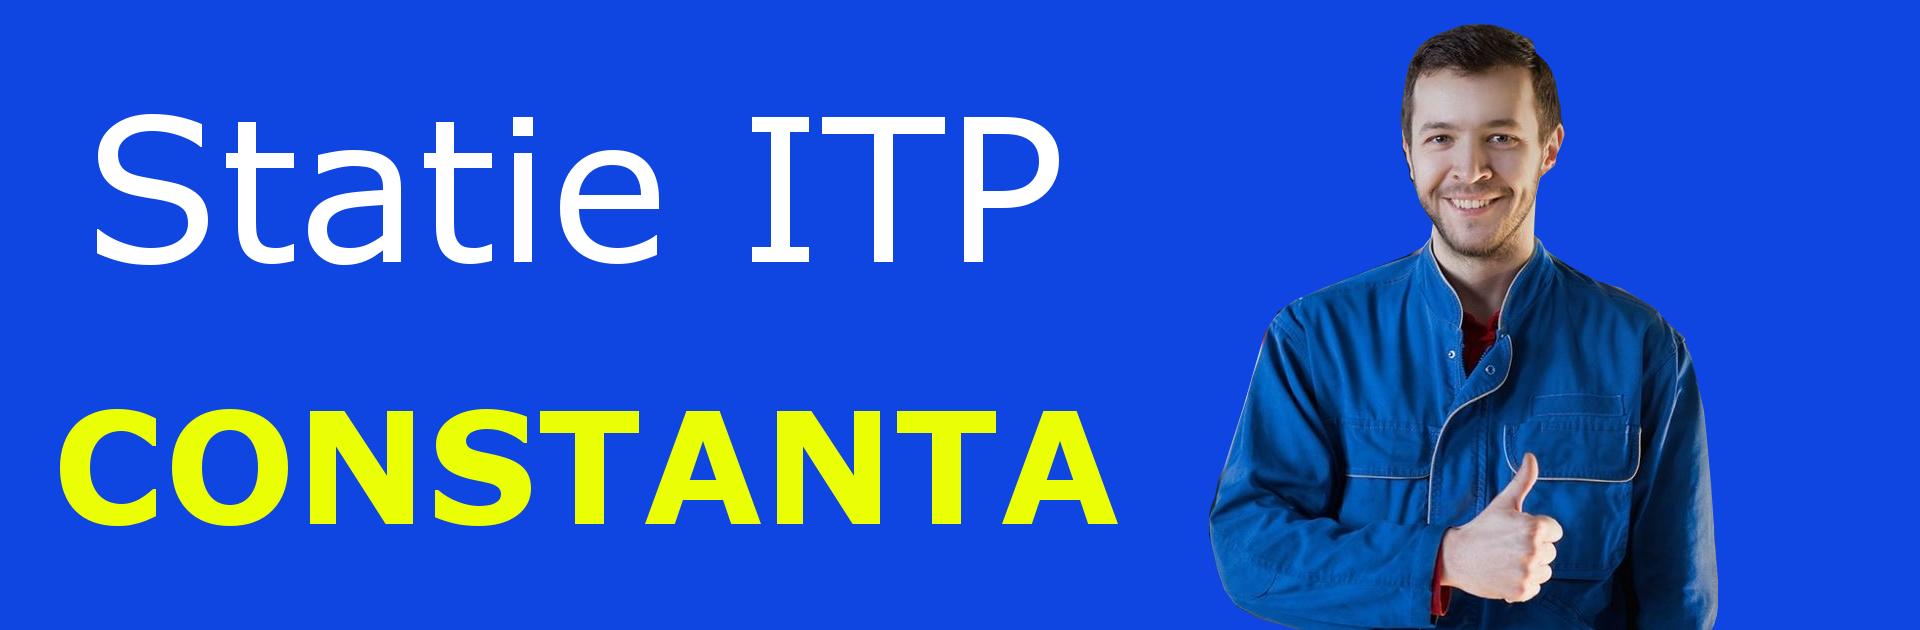 Banner ITP CONSTANTA